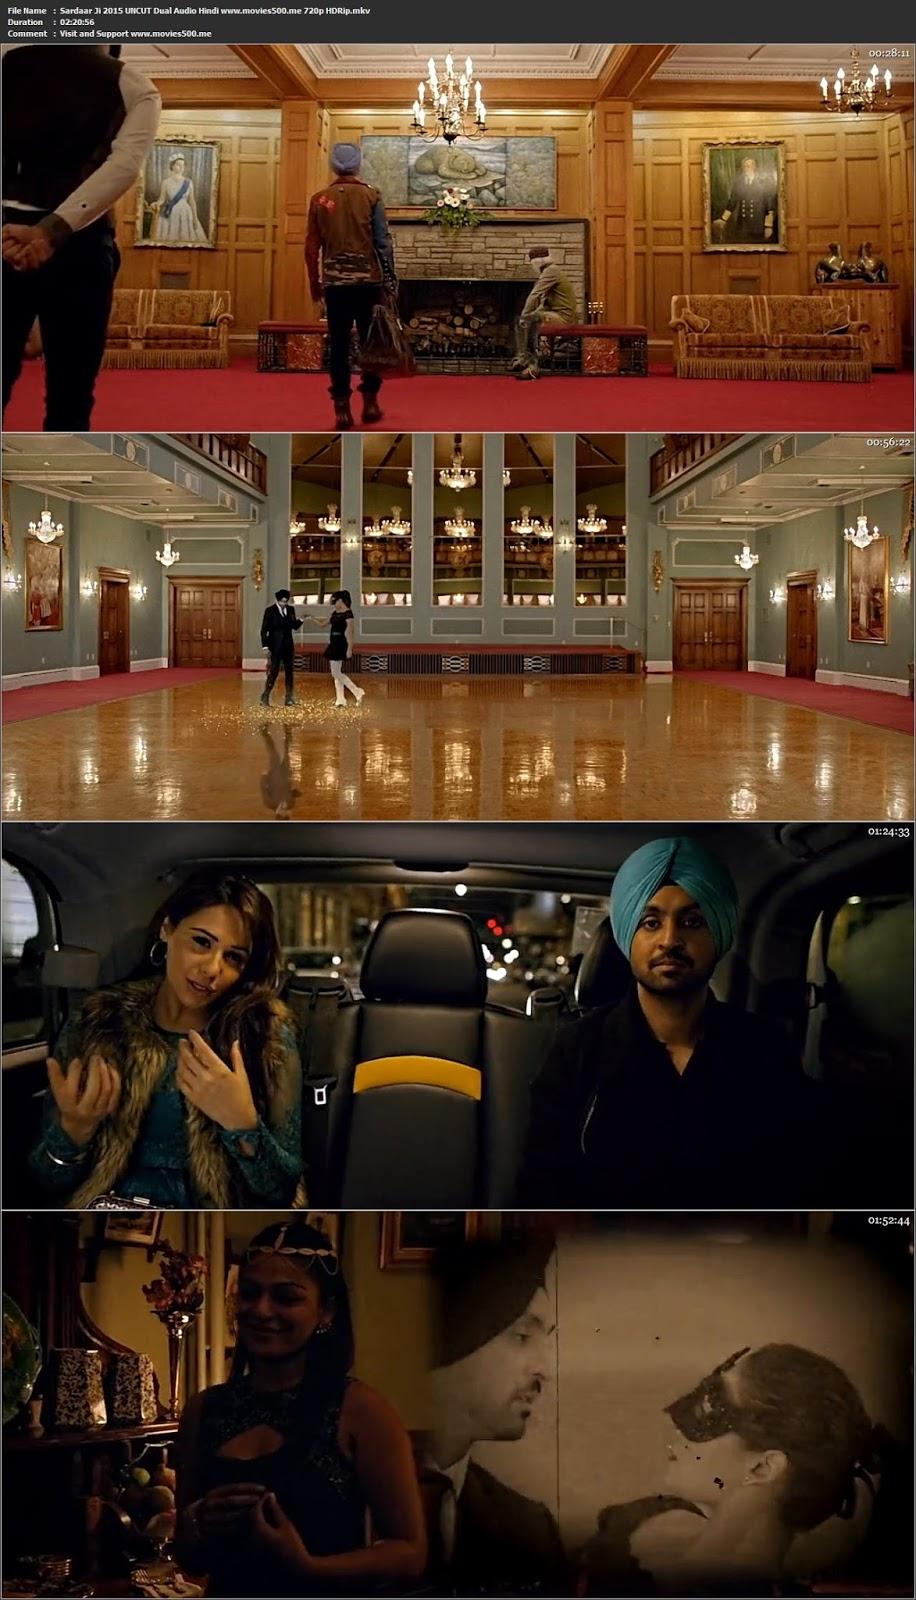 Sardaar Ji 2015 UNCUT Punjabi Movie HDRip 720p 1.4GB at alnoorhayyathotels.com